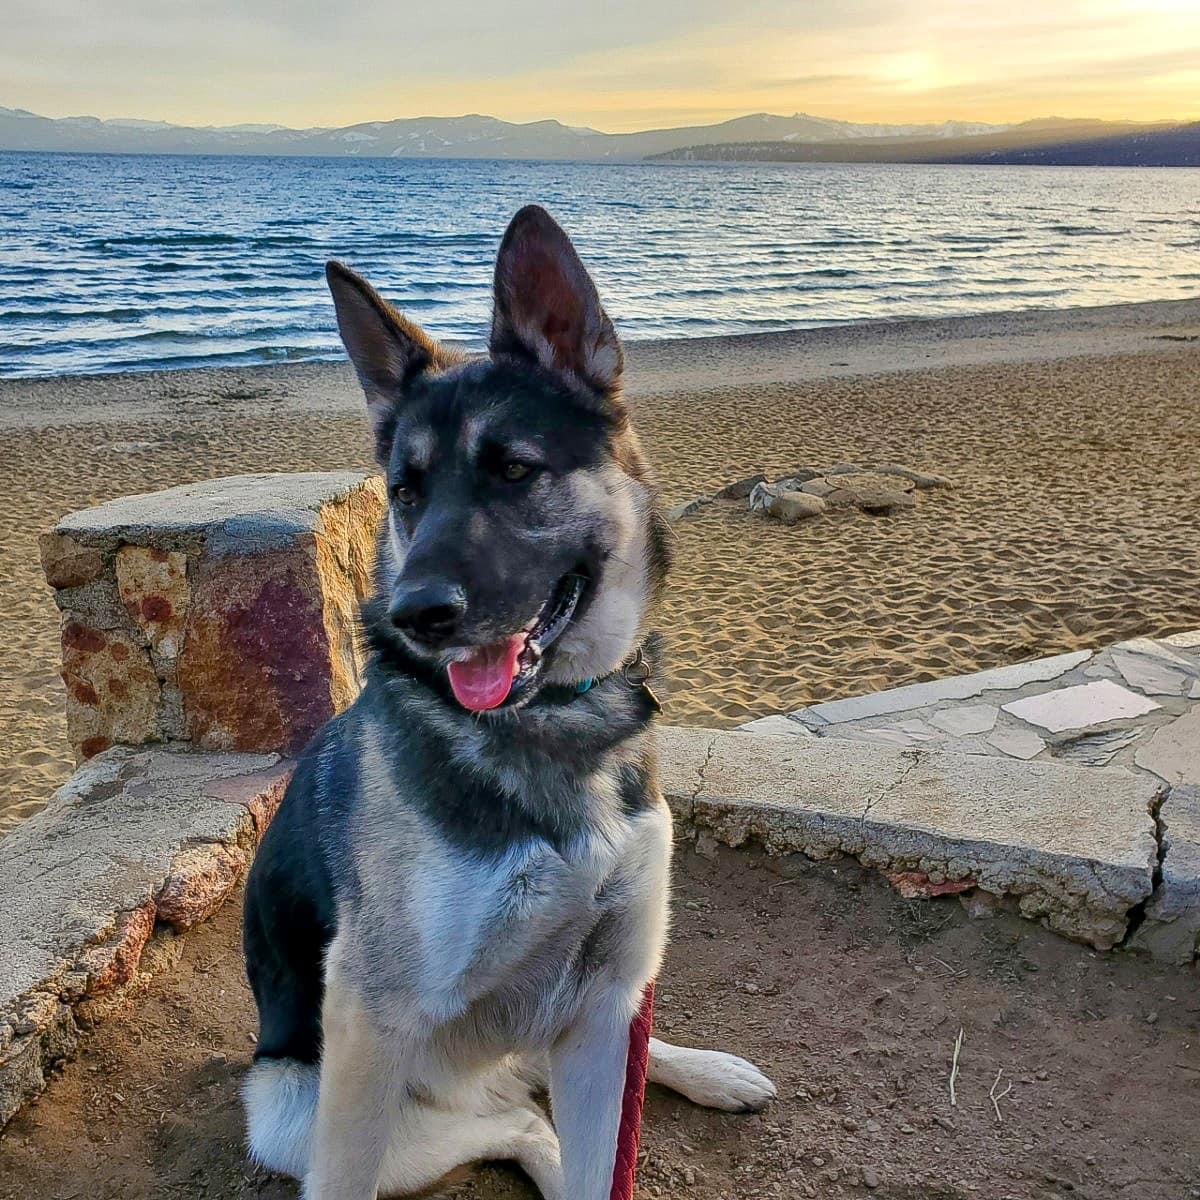 Kota the Rescue Dog